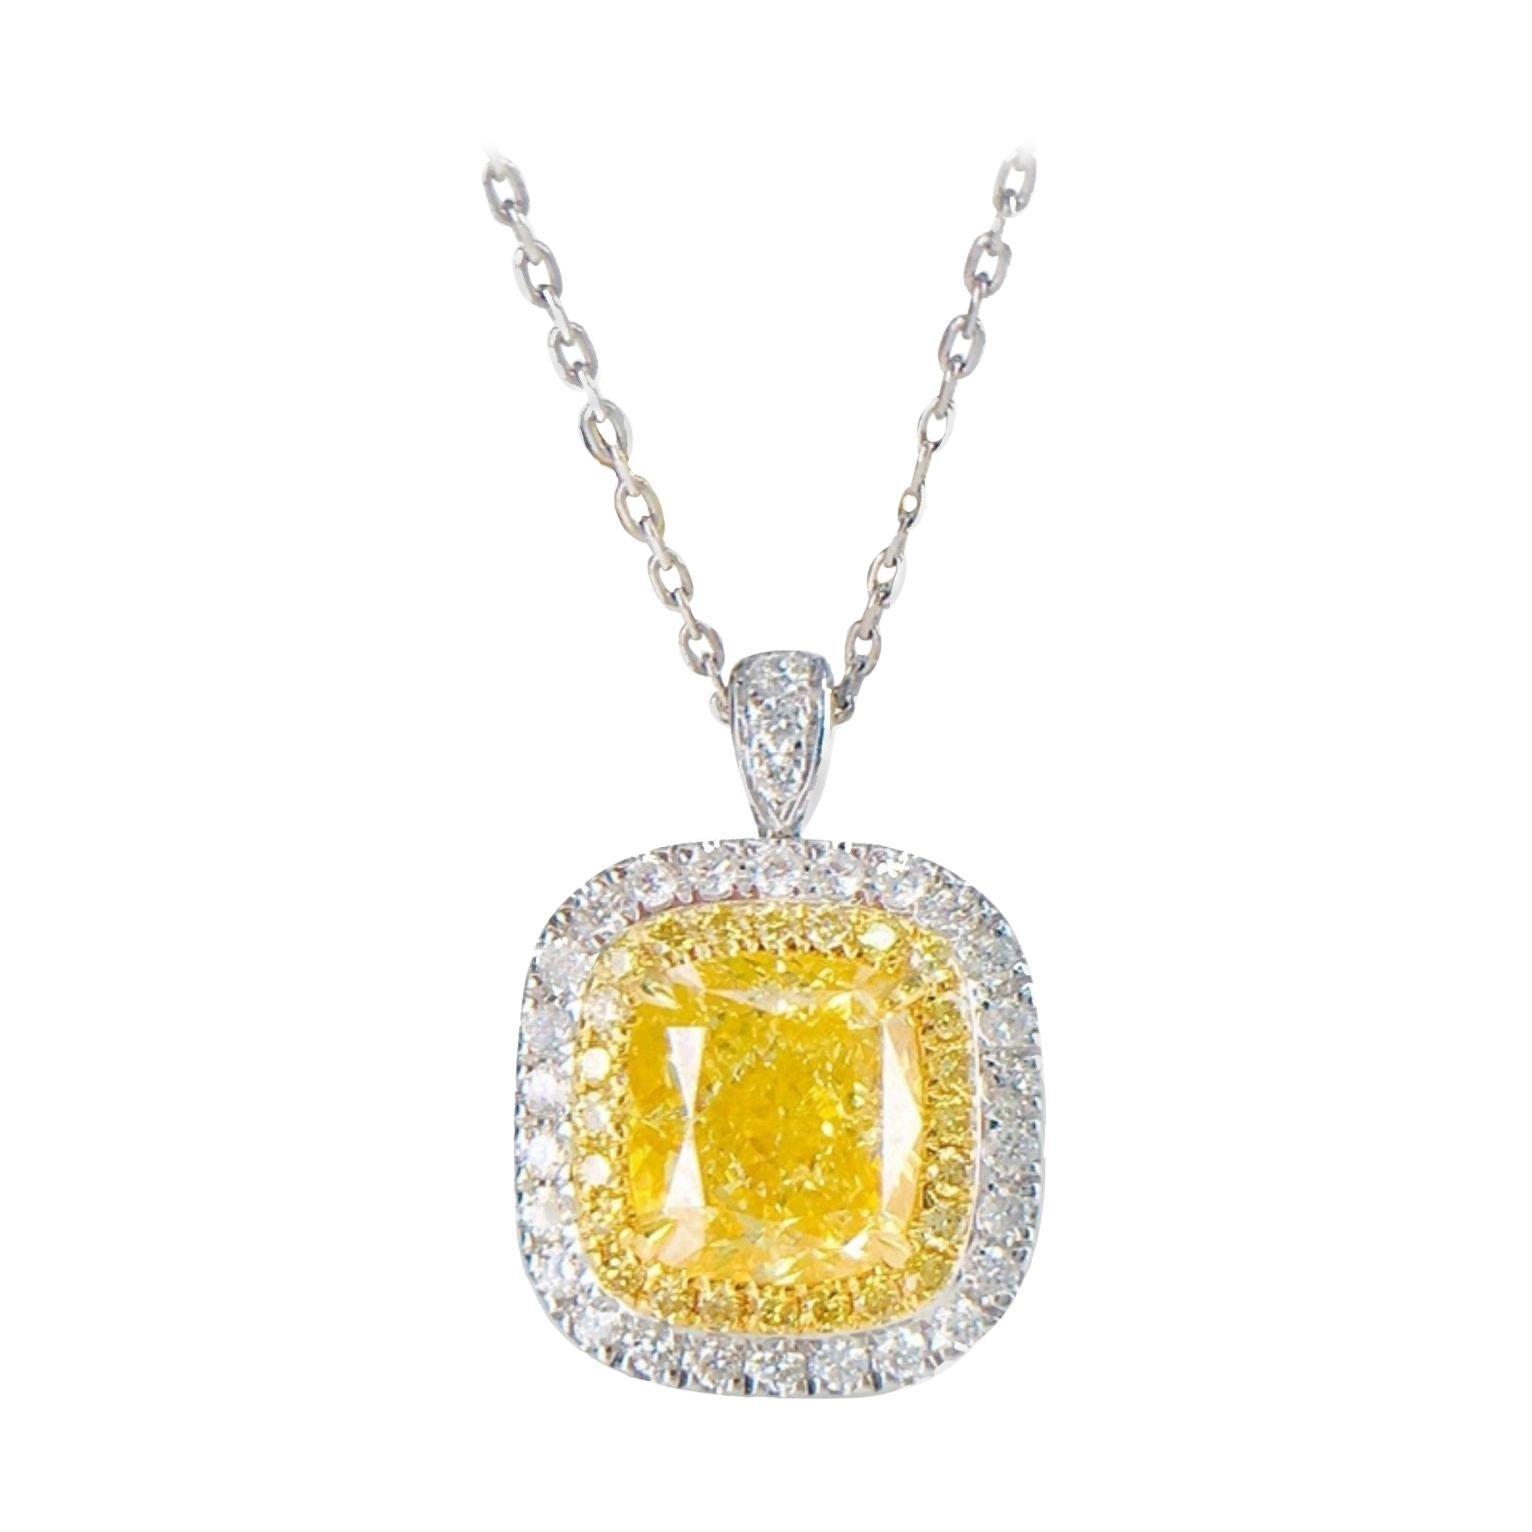 2 Carat Yellow Diamond Necklace 18k White Gold